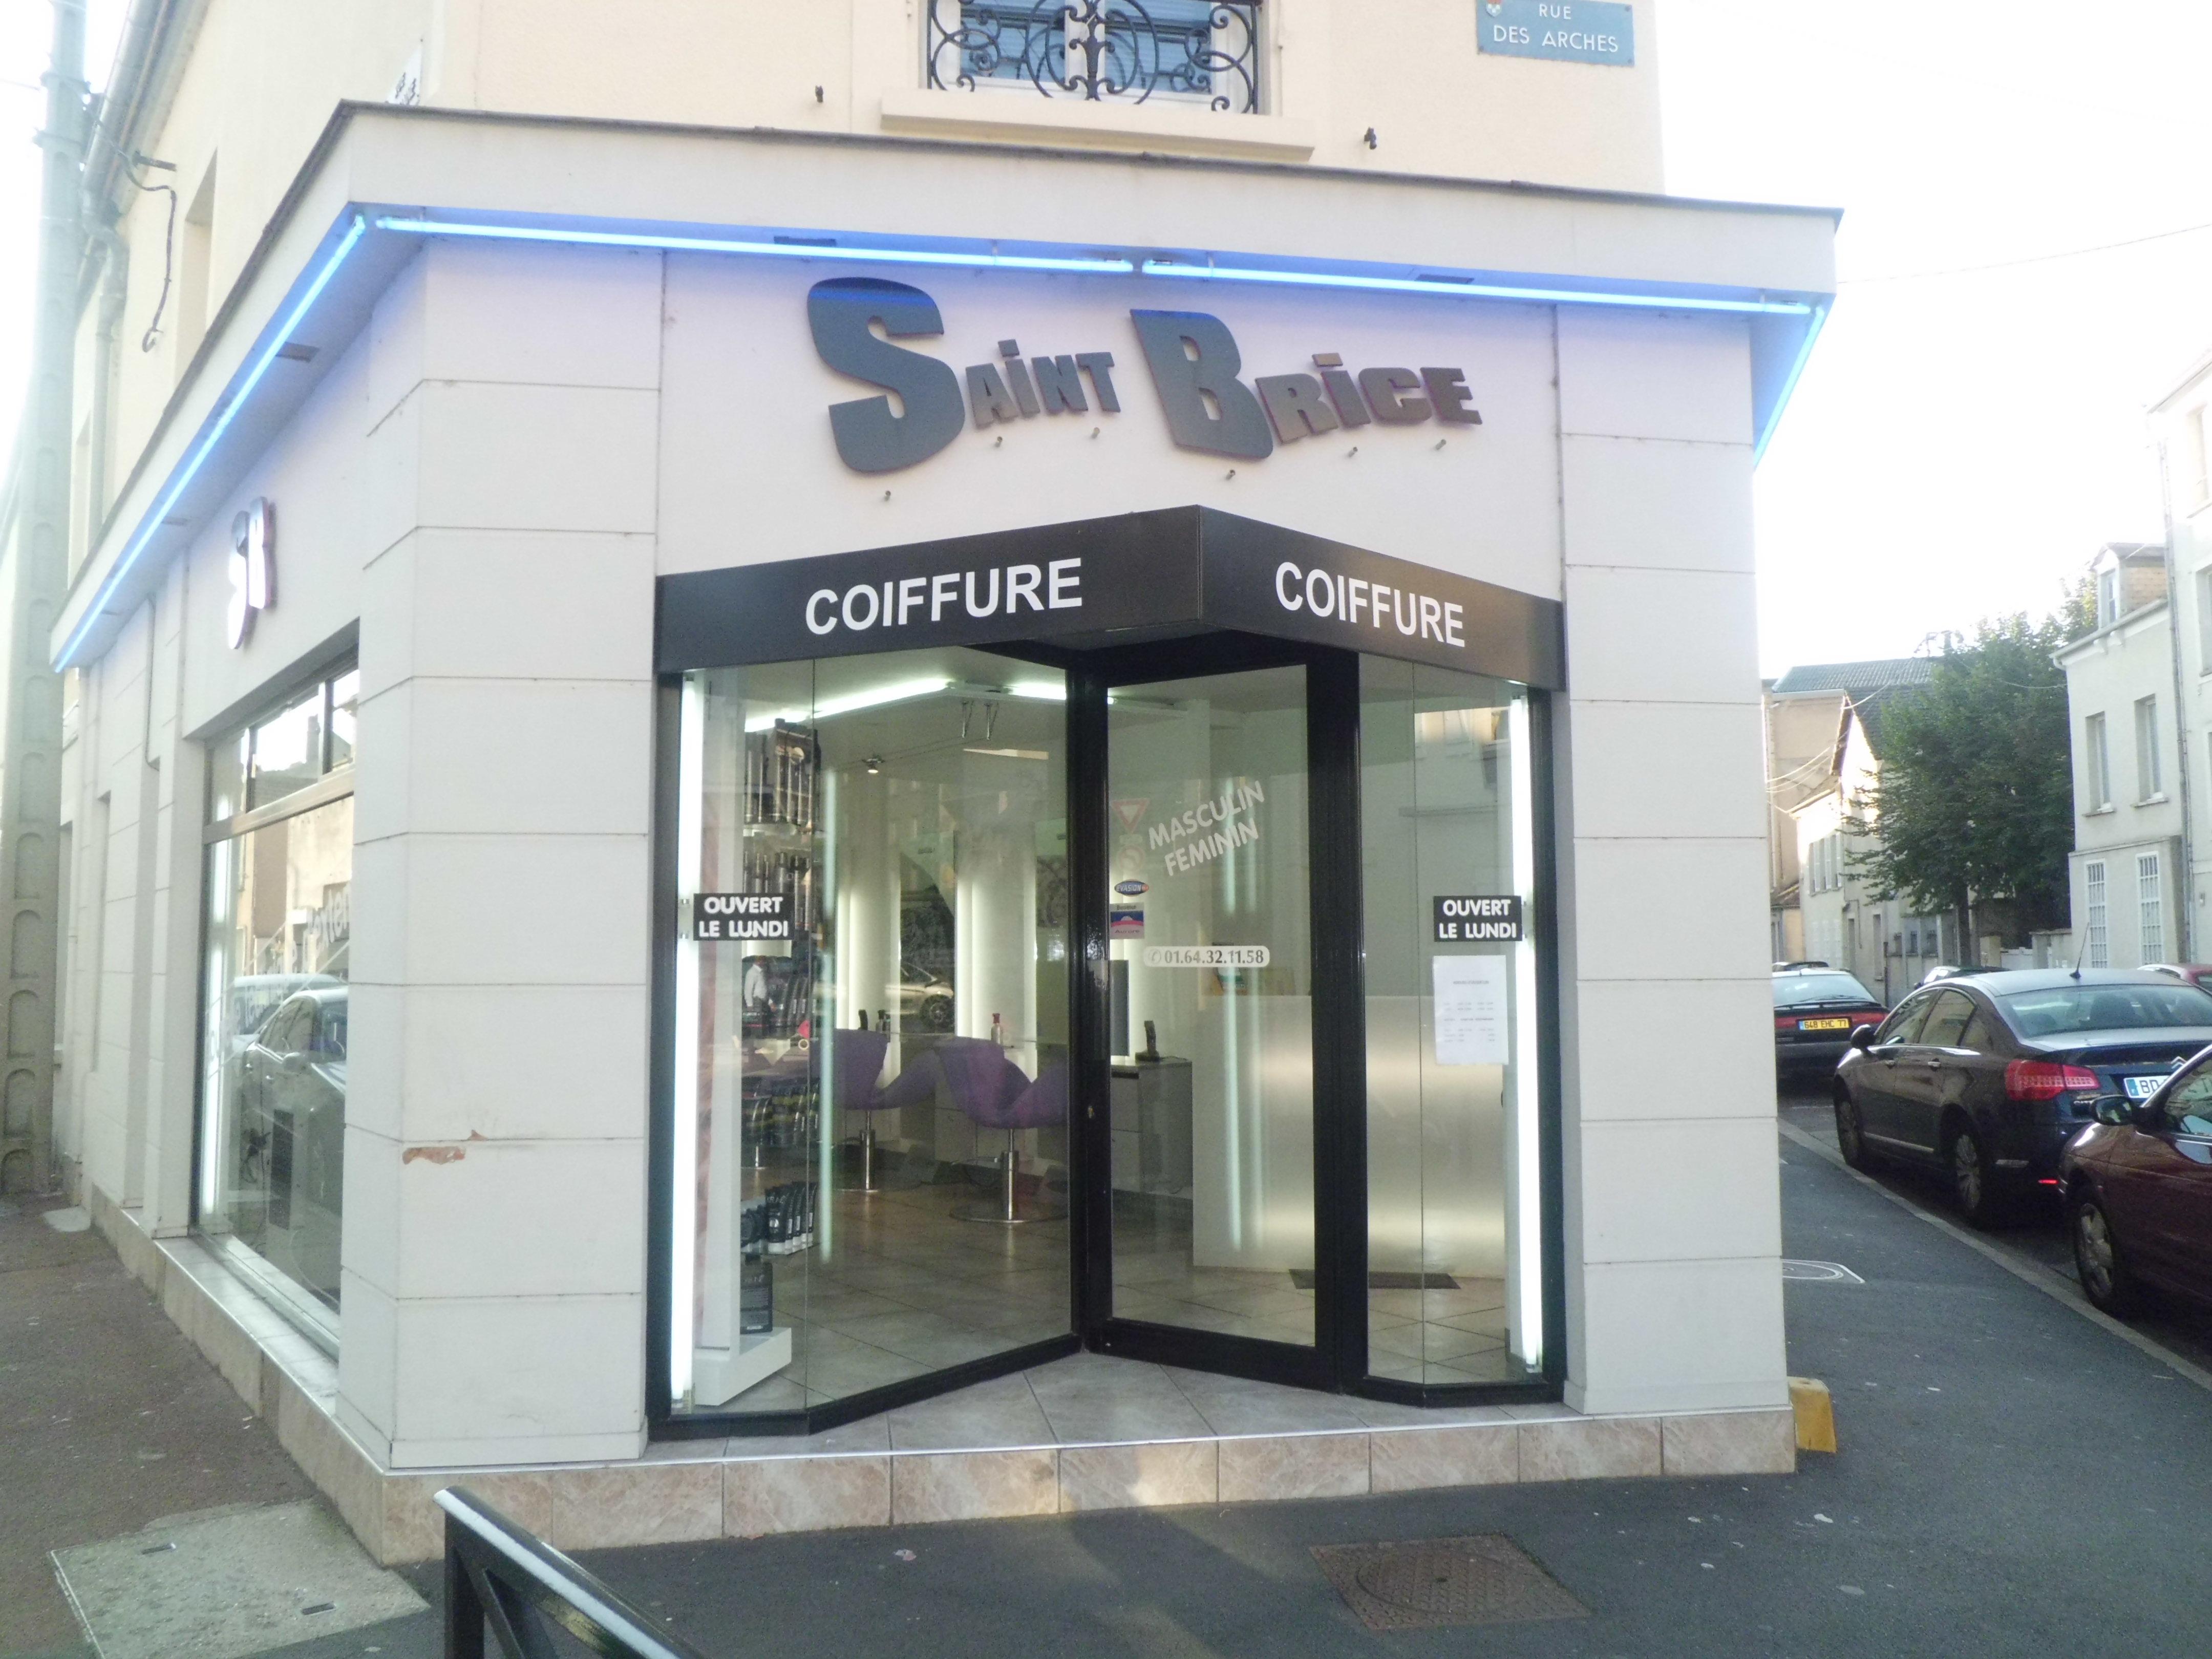 Saint Brice Coiffure